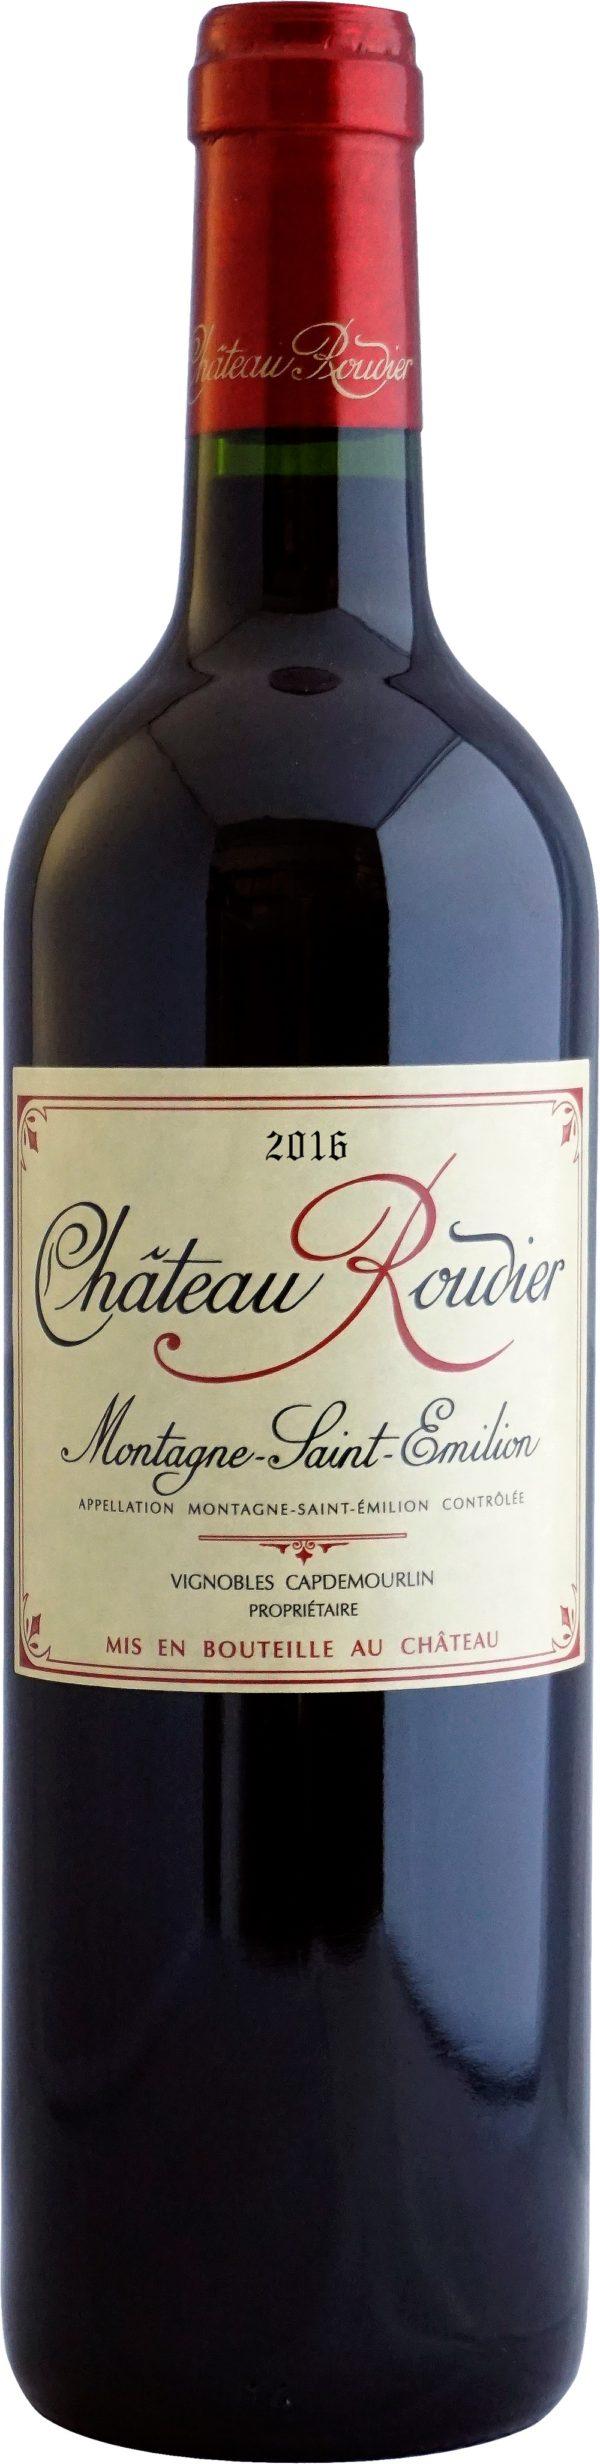 Château Roudier 2016